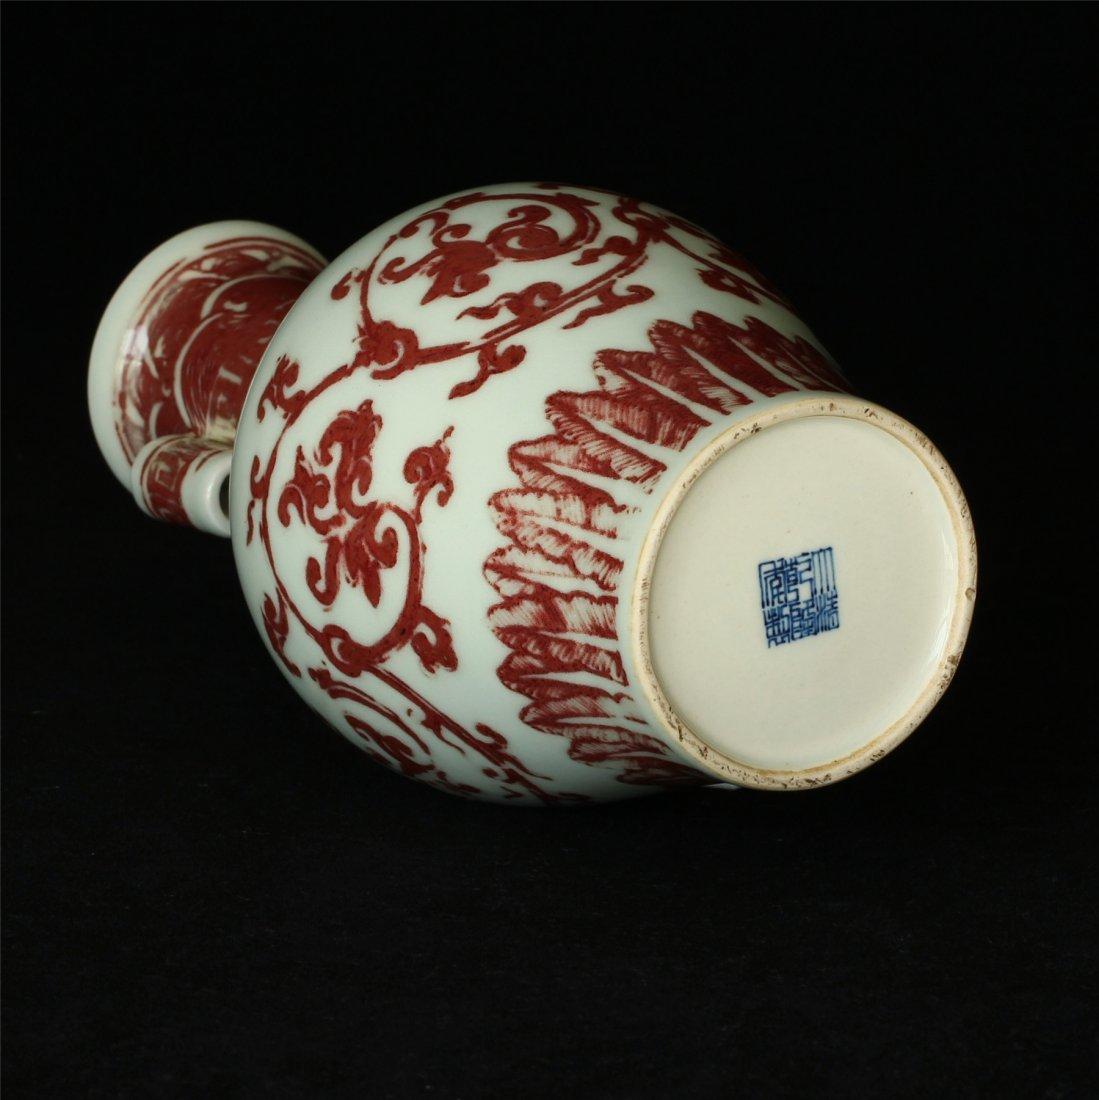 Underglaze red porcelain vase of Qing Dynasty QianLong - 6